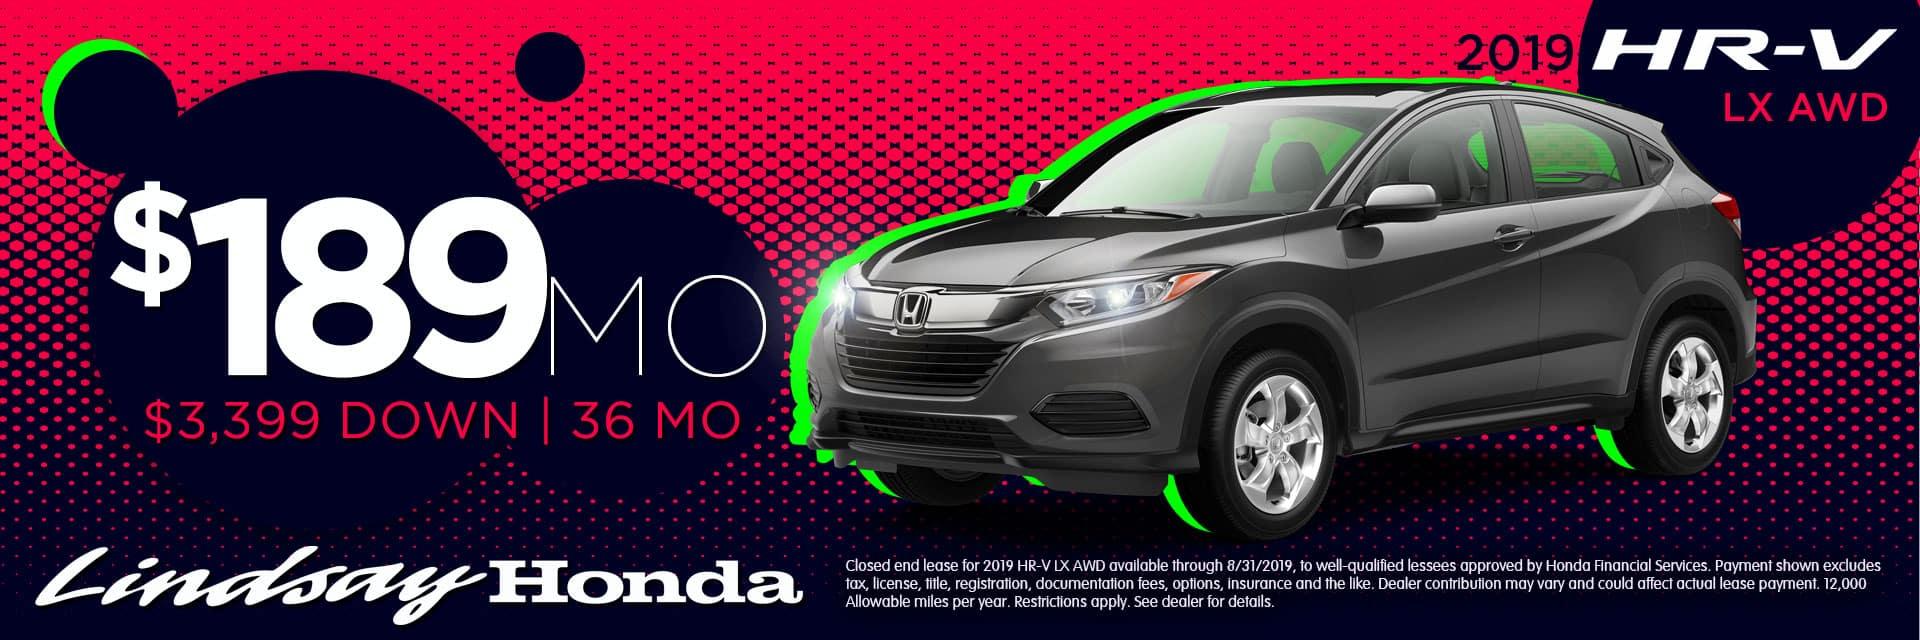 Honda Financial Services Account Management >> Lindsay Honda Honda Dealer In Columbus Oh